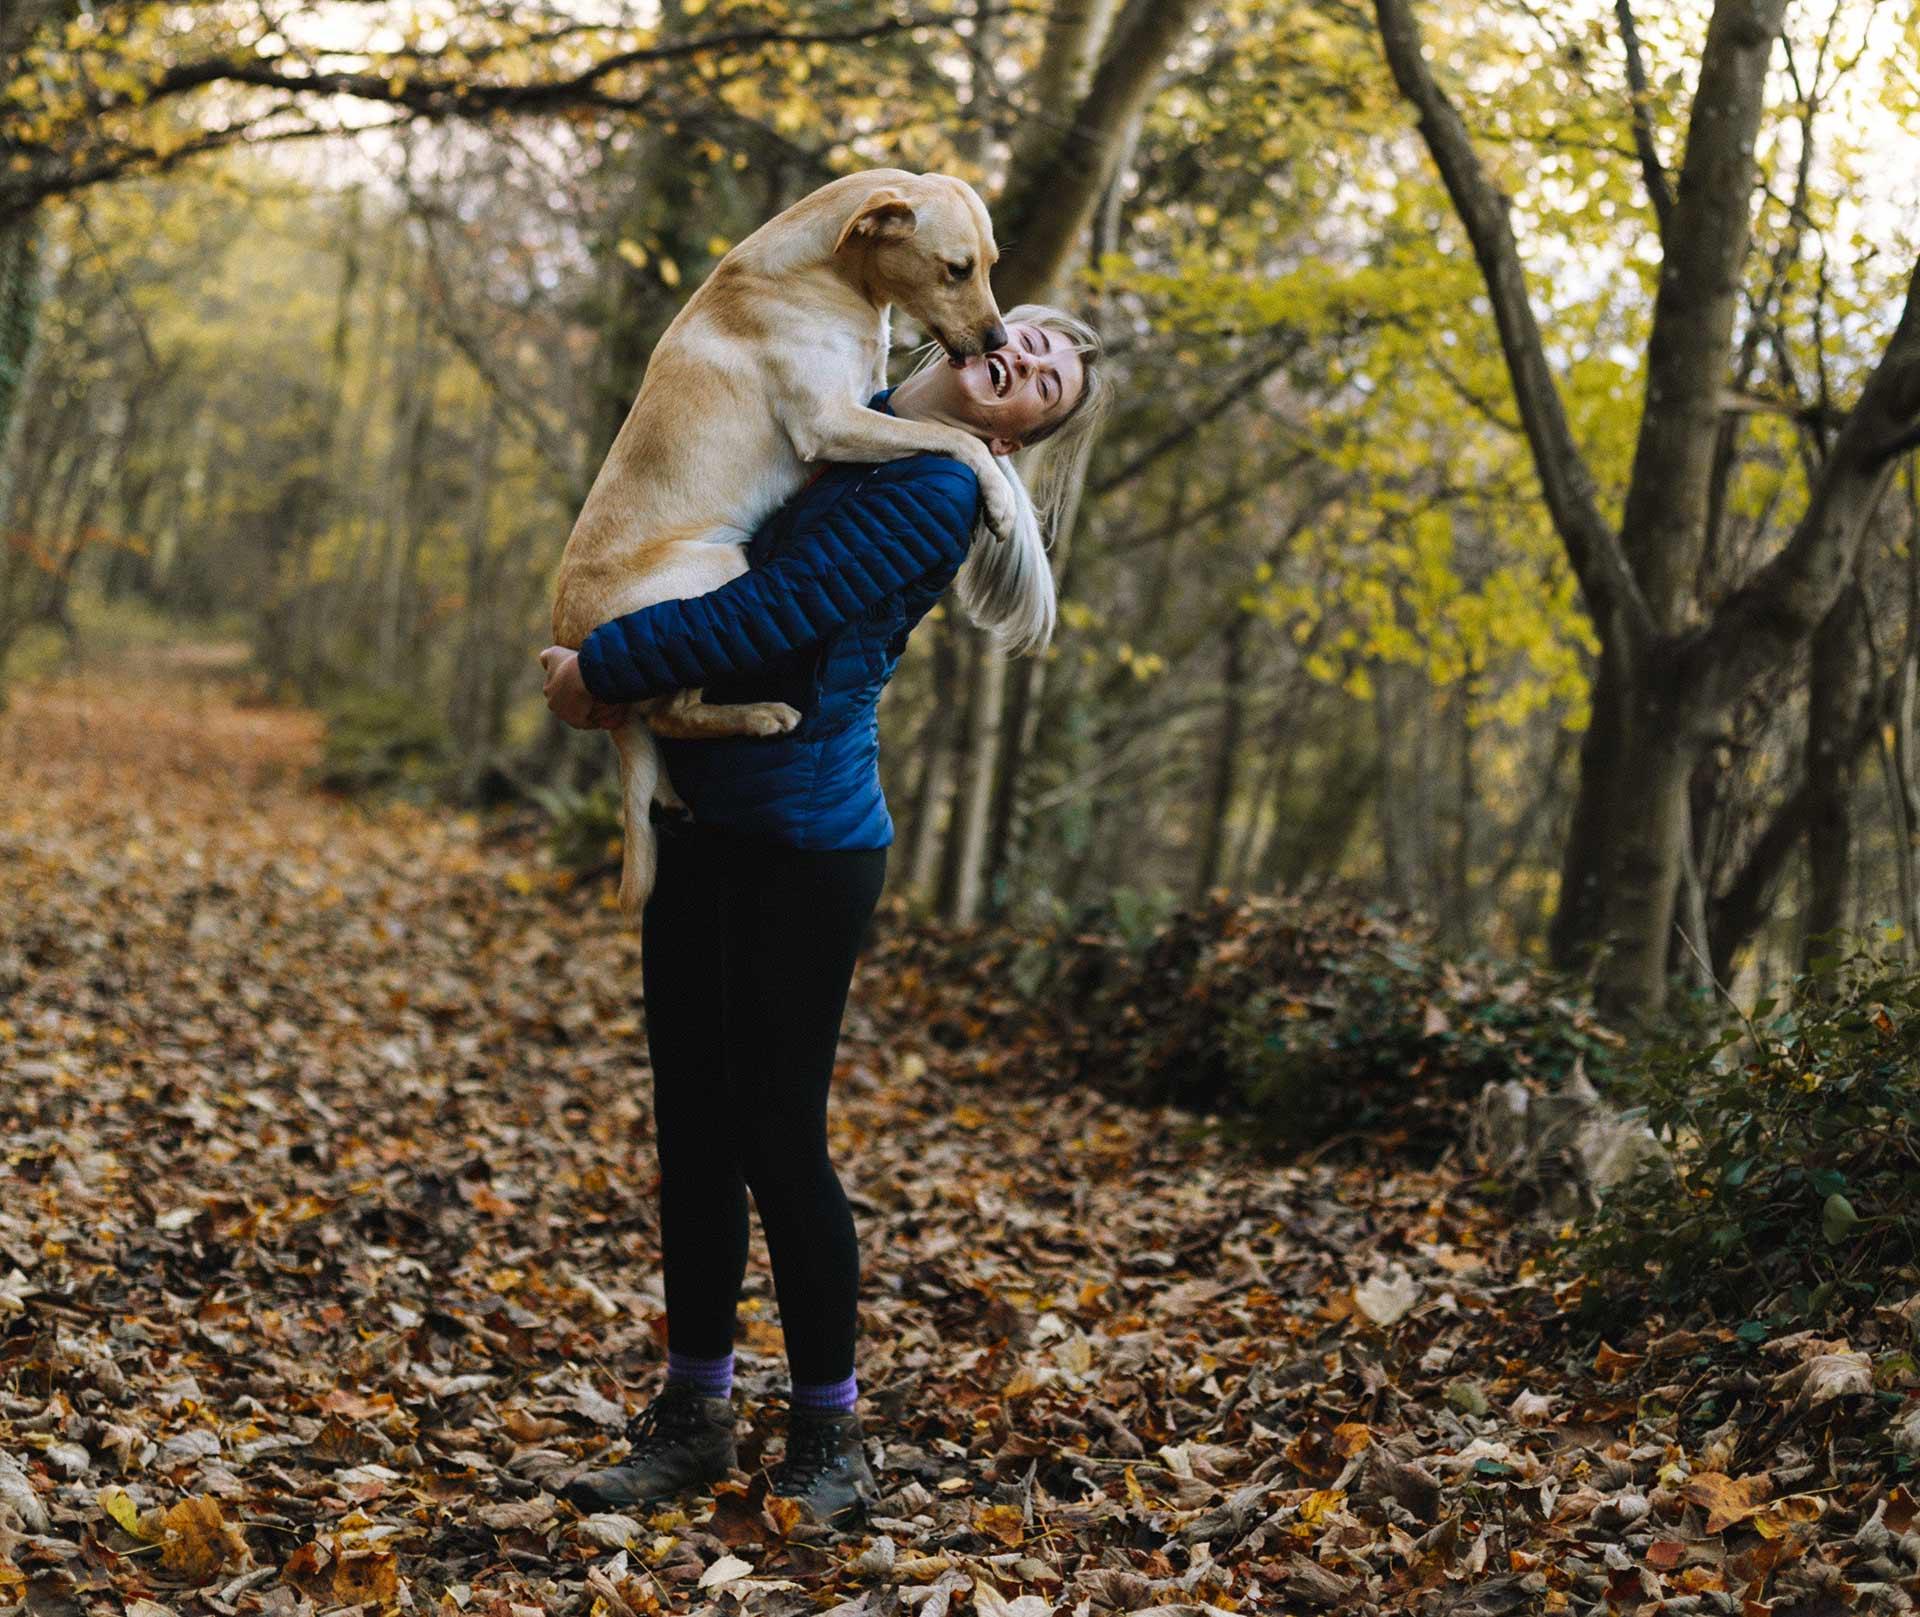 Dog-Friendly Lodges